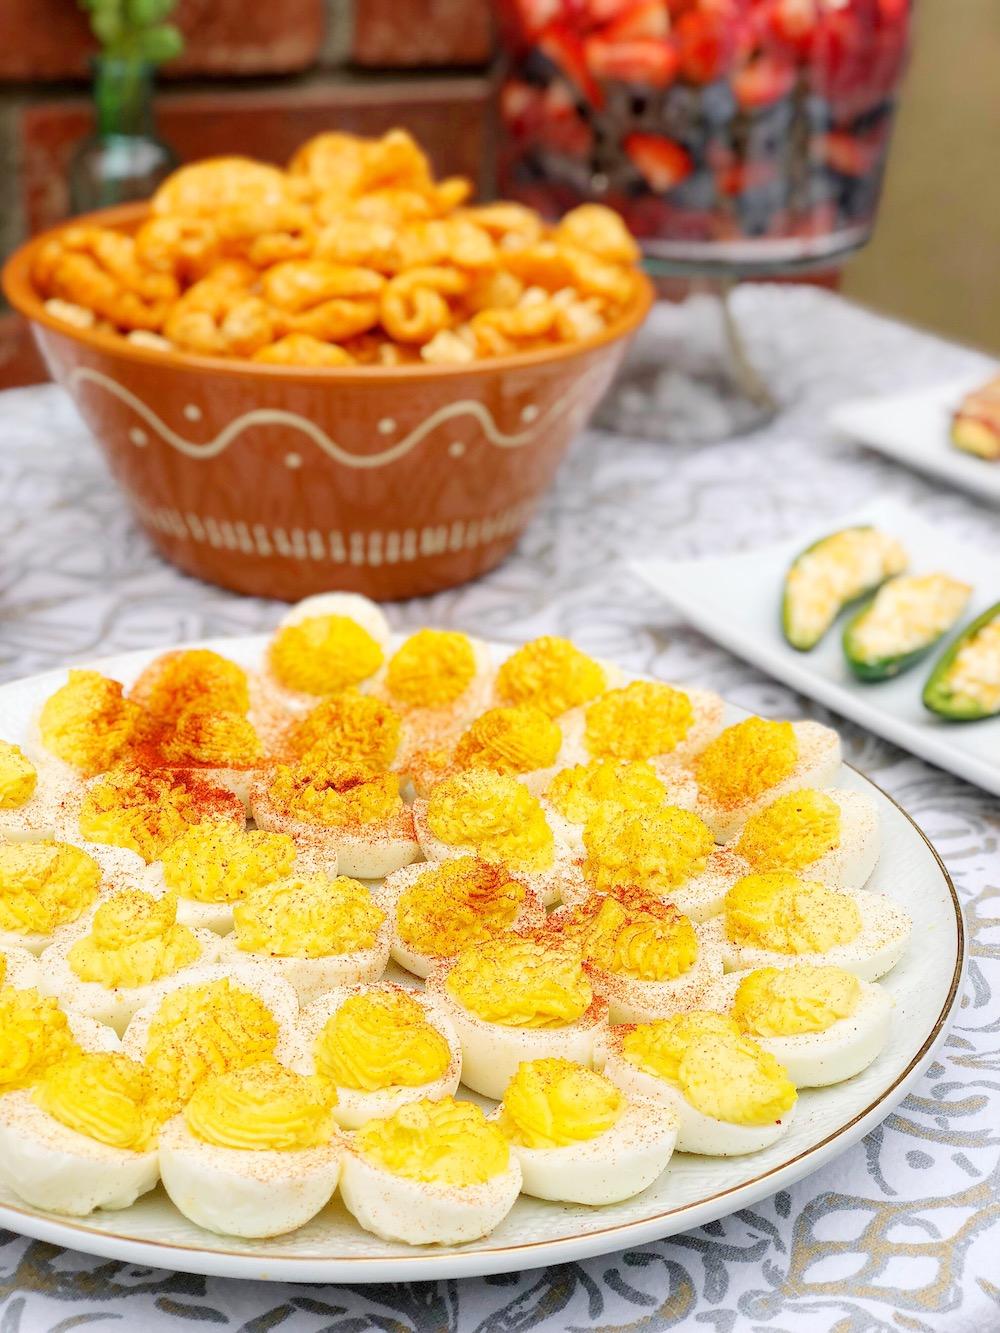 deviled eggs and pork rinds on table - livingmividaloca.com